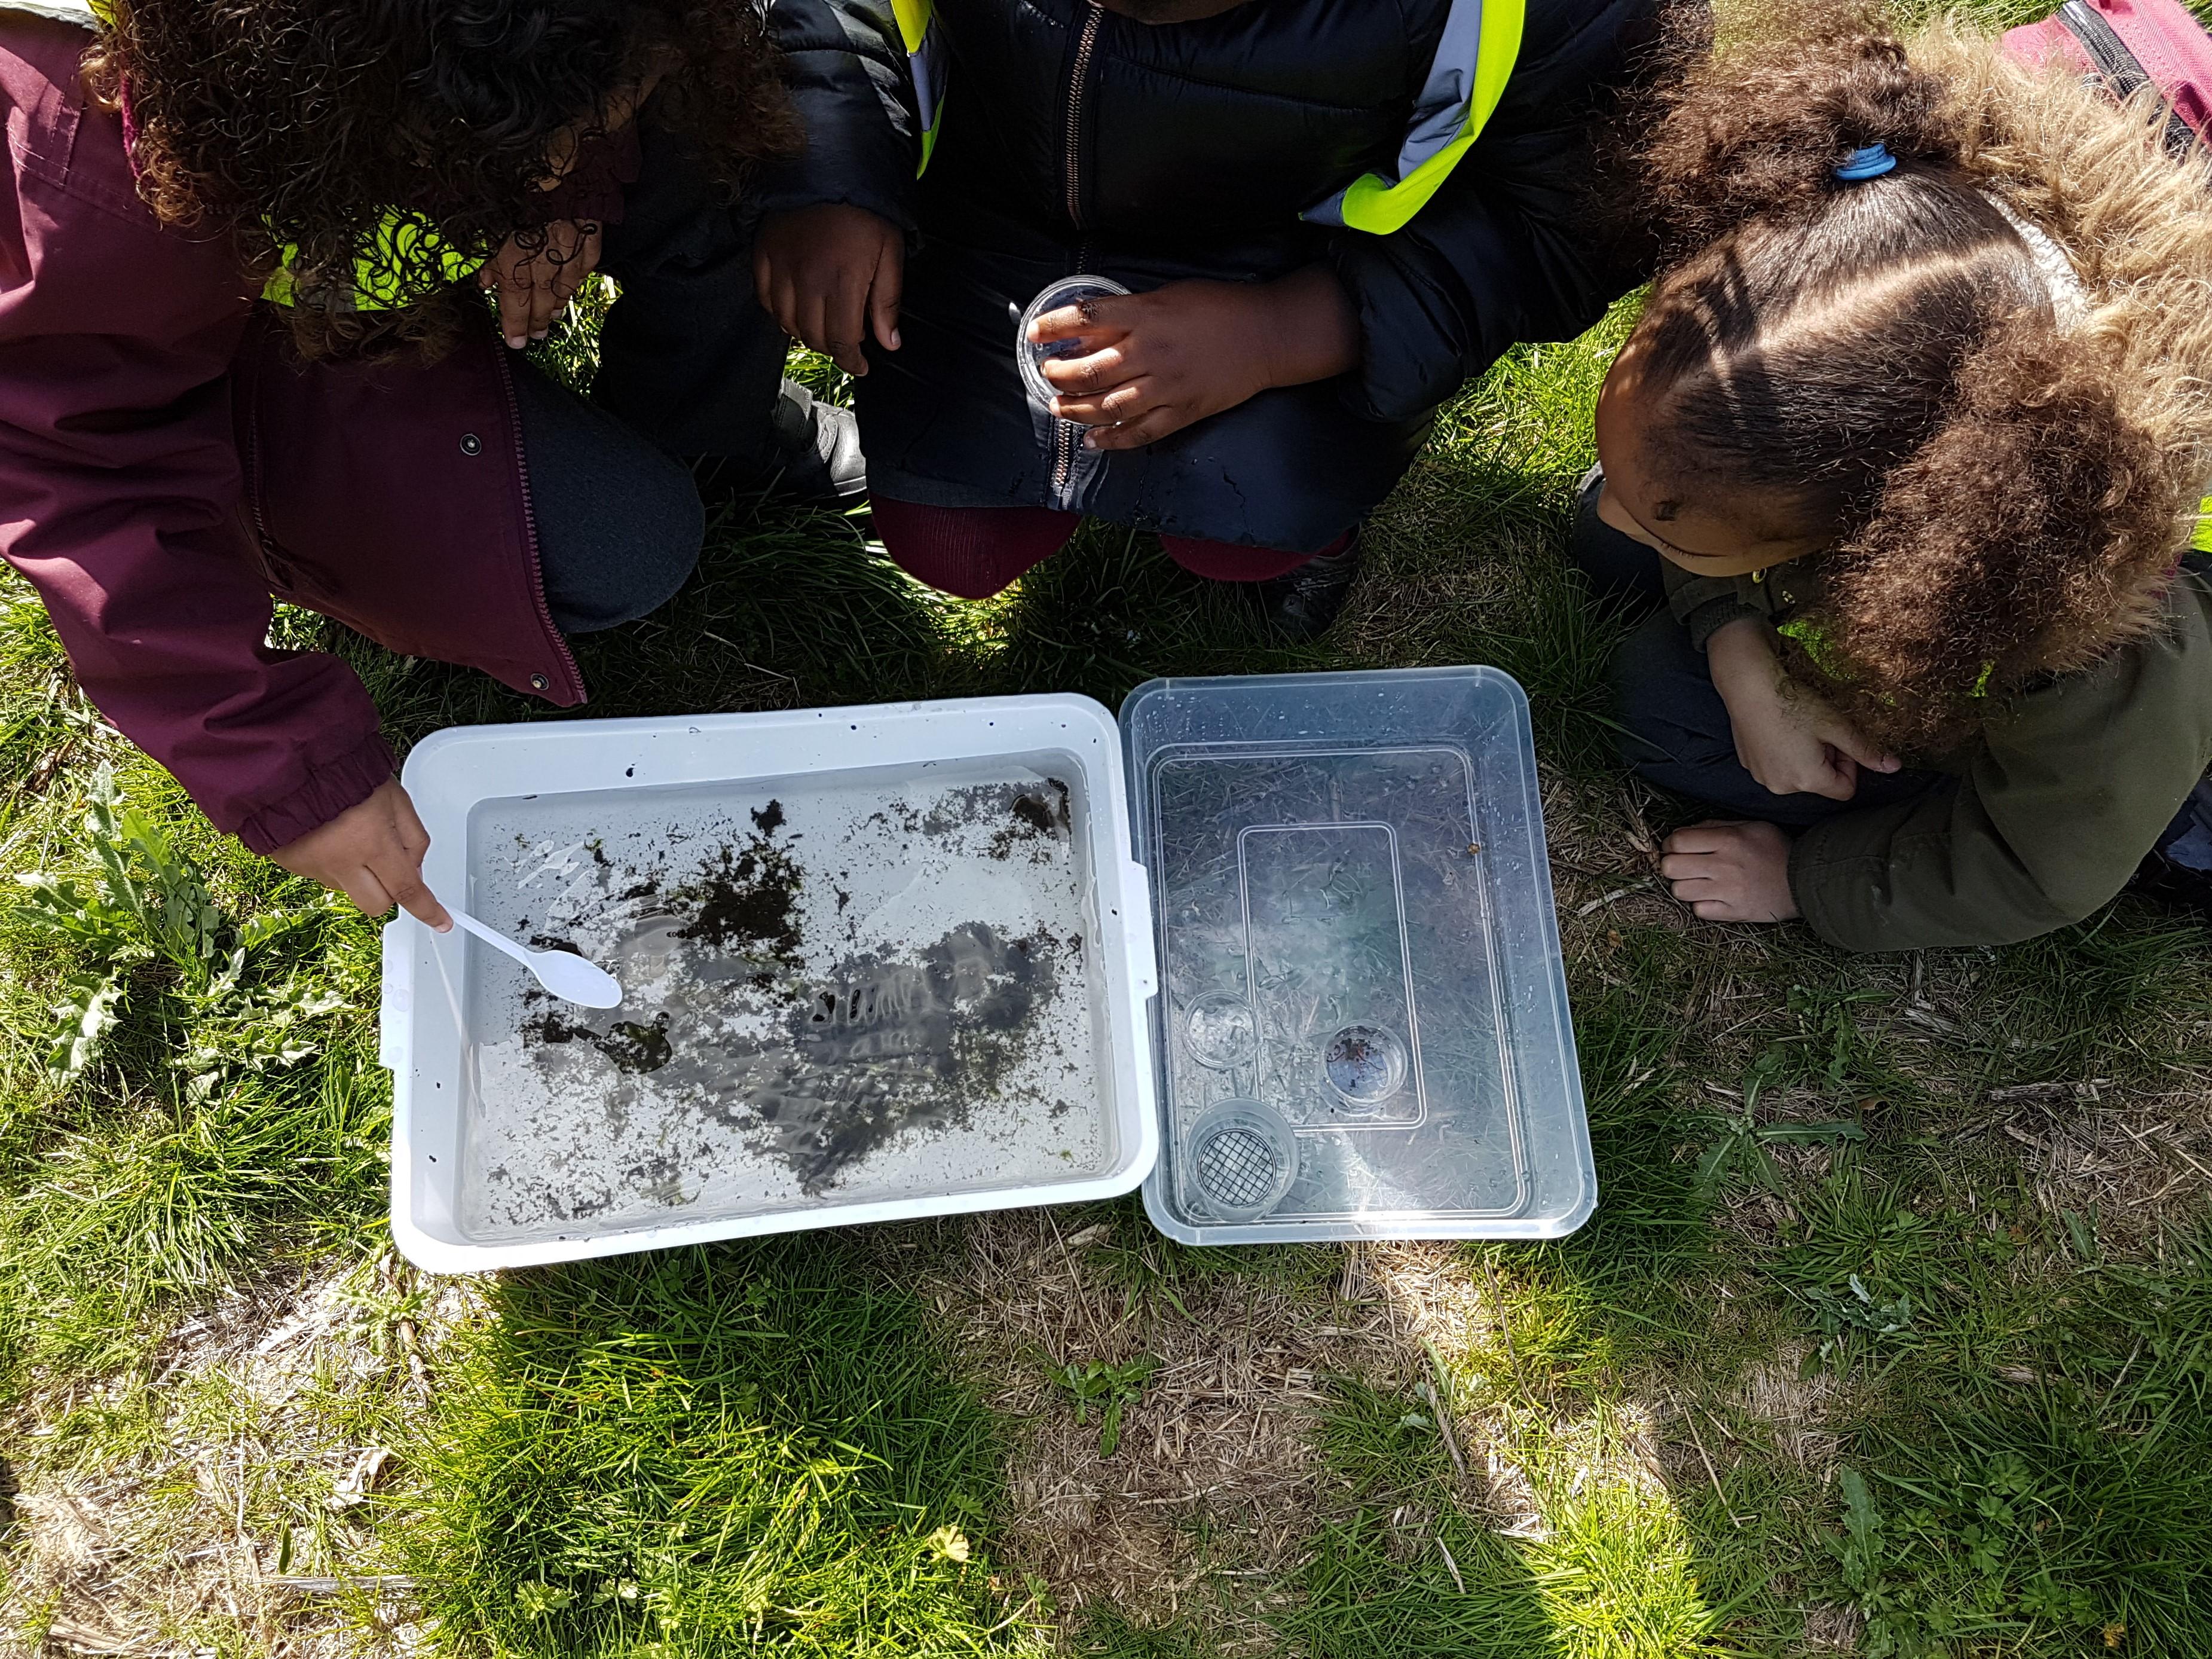 River Wildlife - exploring the sample tray